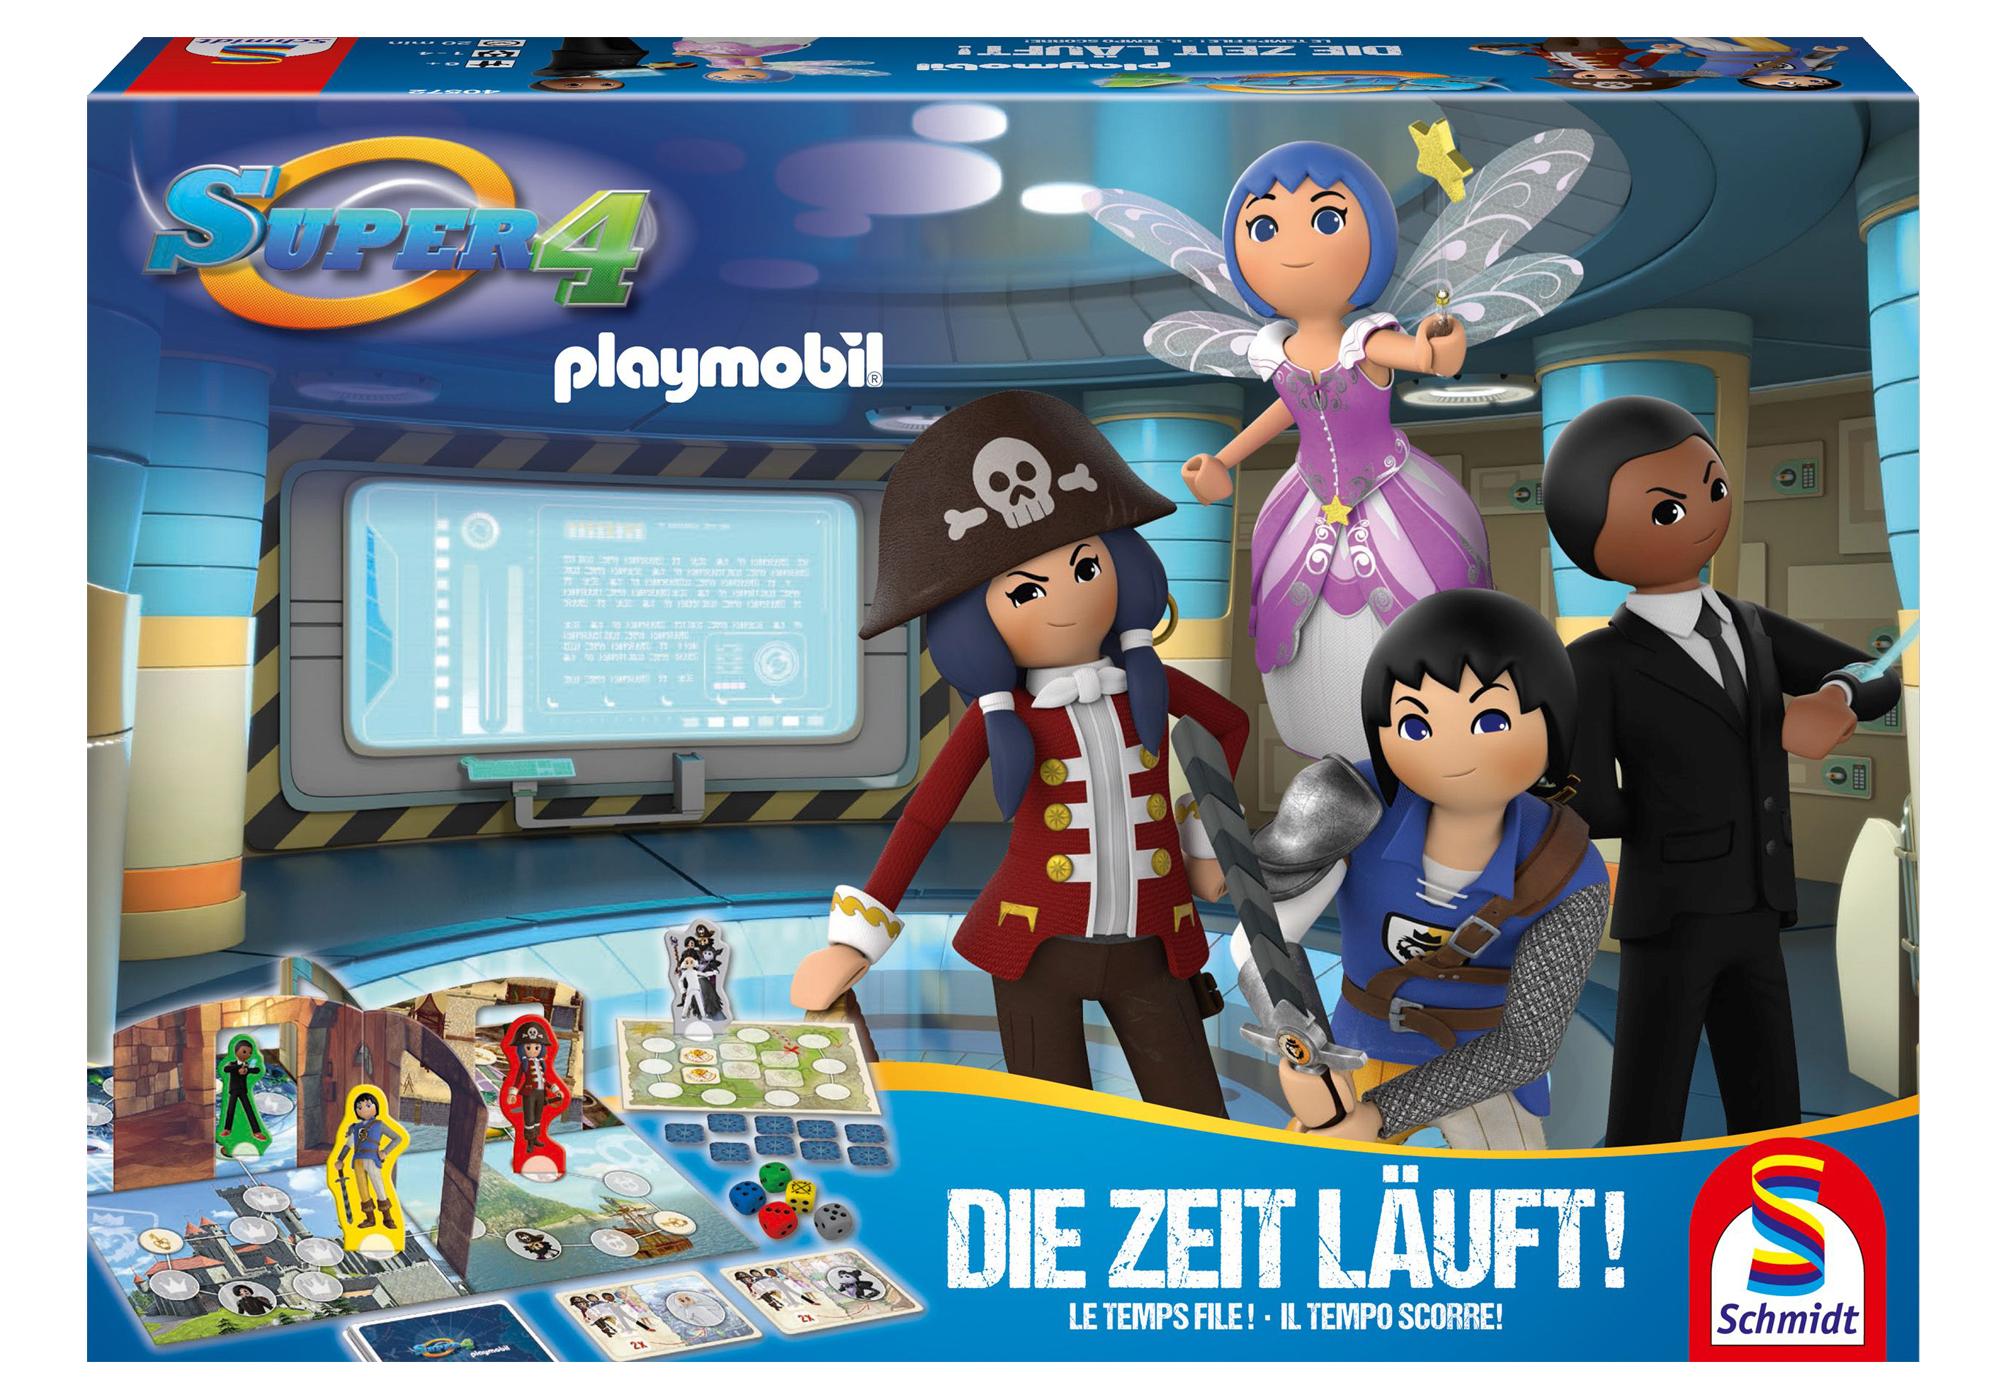 http://media.playmobil.com/i/playmobil/80705_product_detail